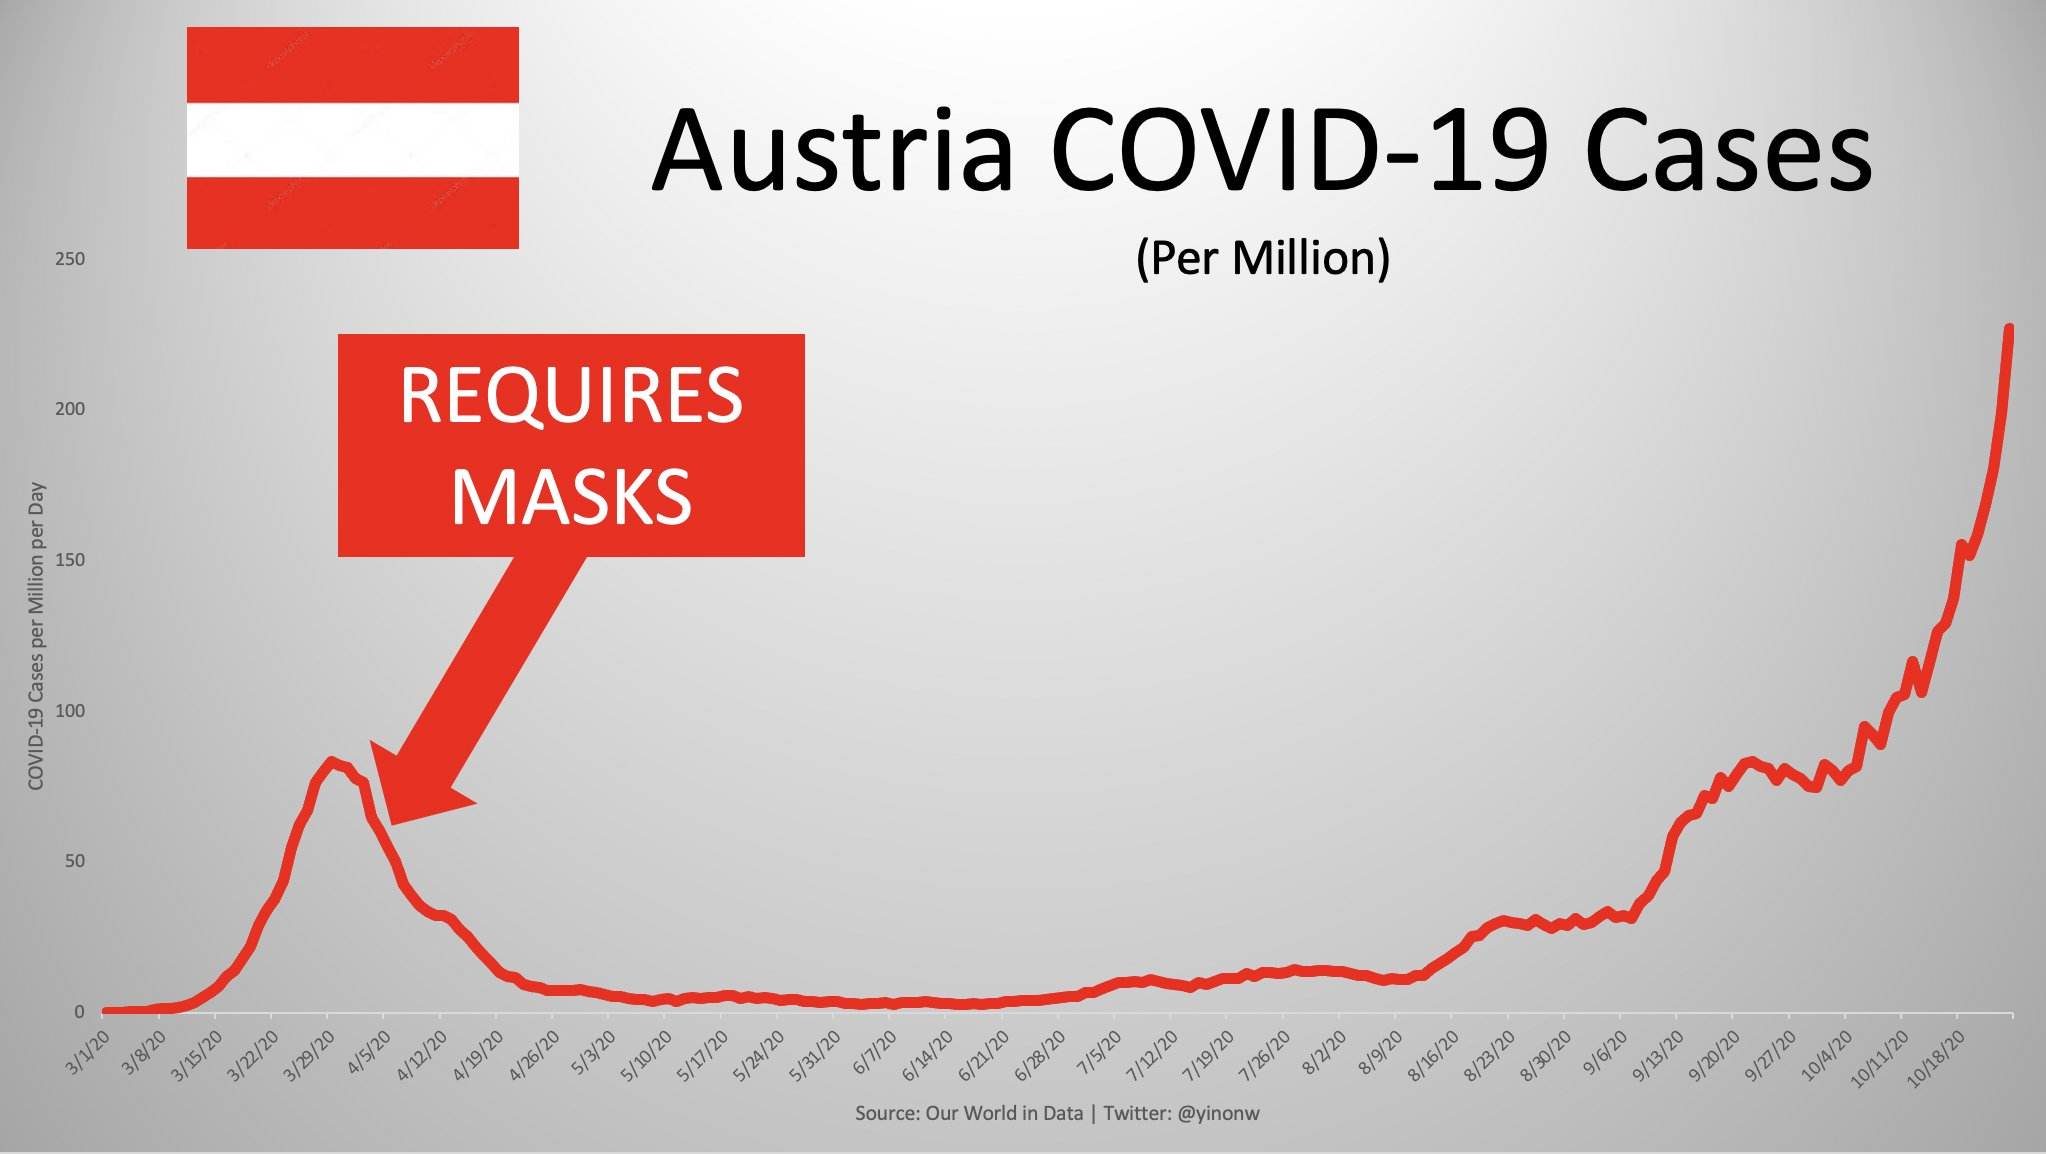 Are Face Masks Effective? The Evidence. Masks-austria-1